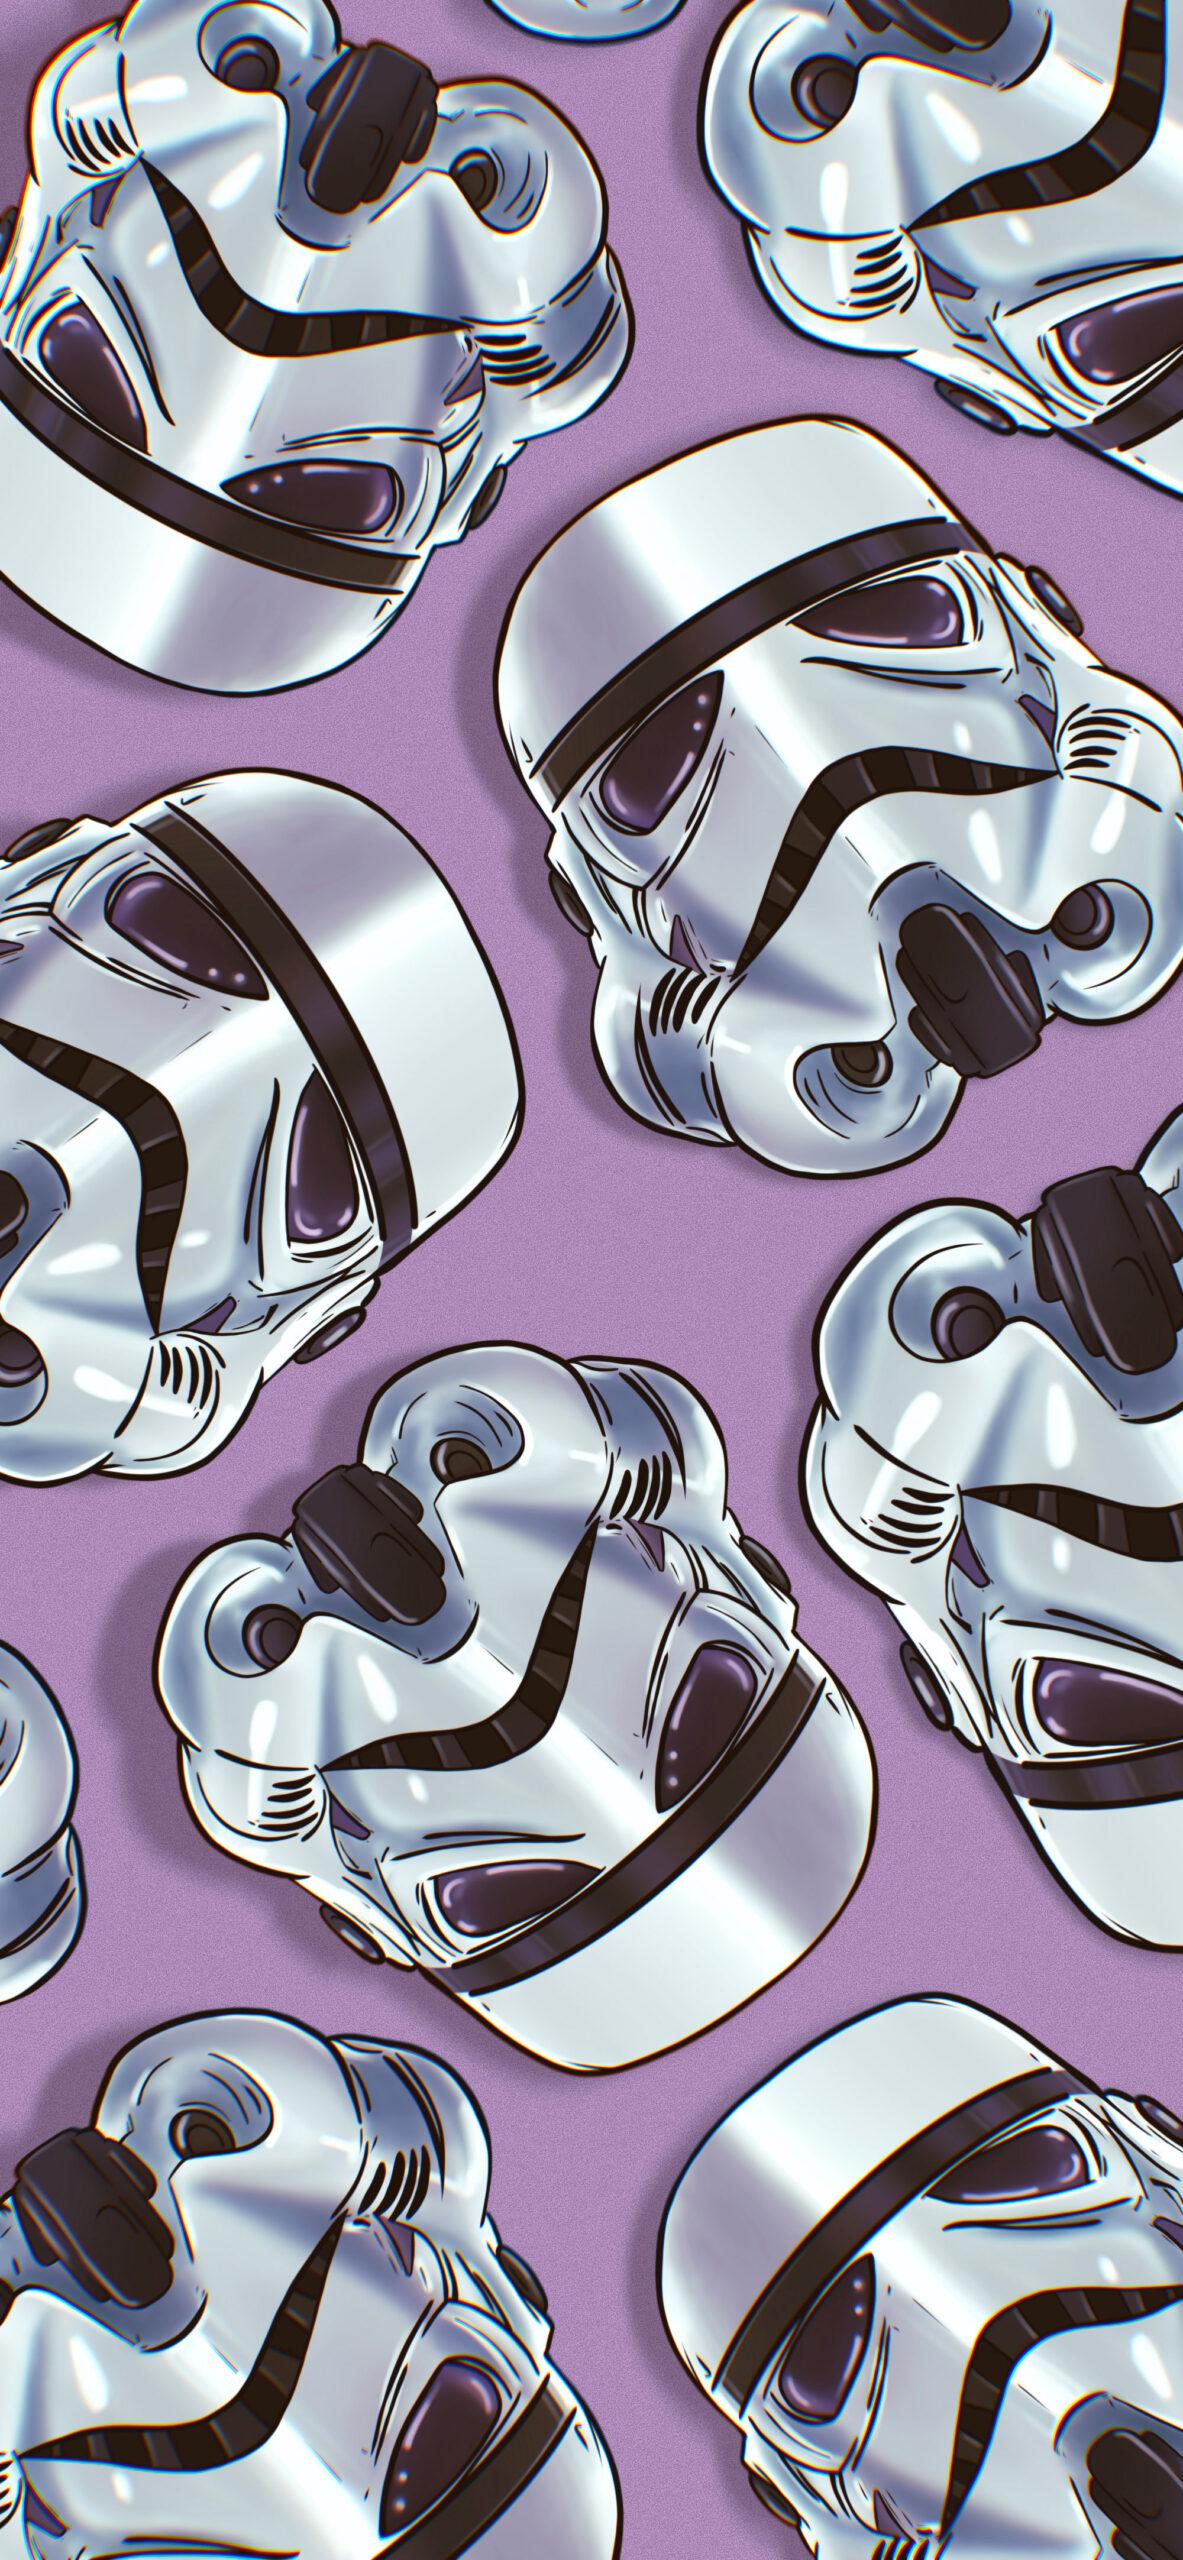 star wars stormtrooper helmet purple wallpaper 2